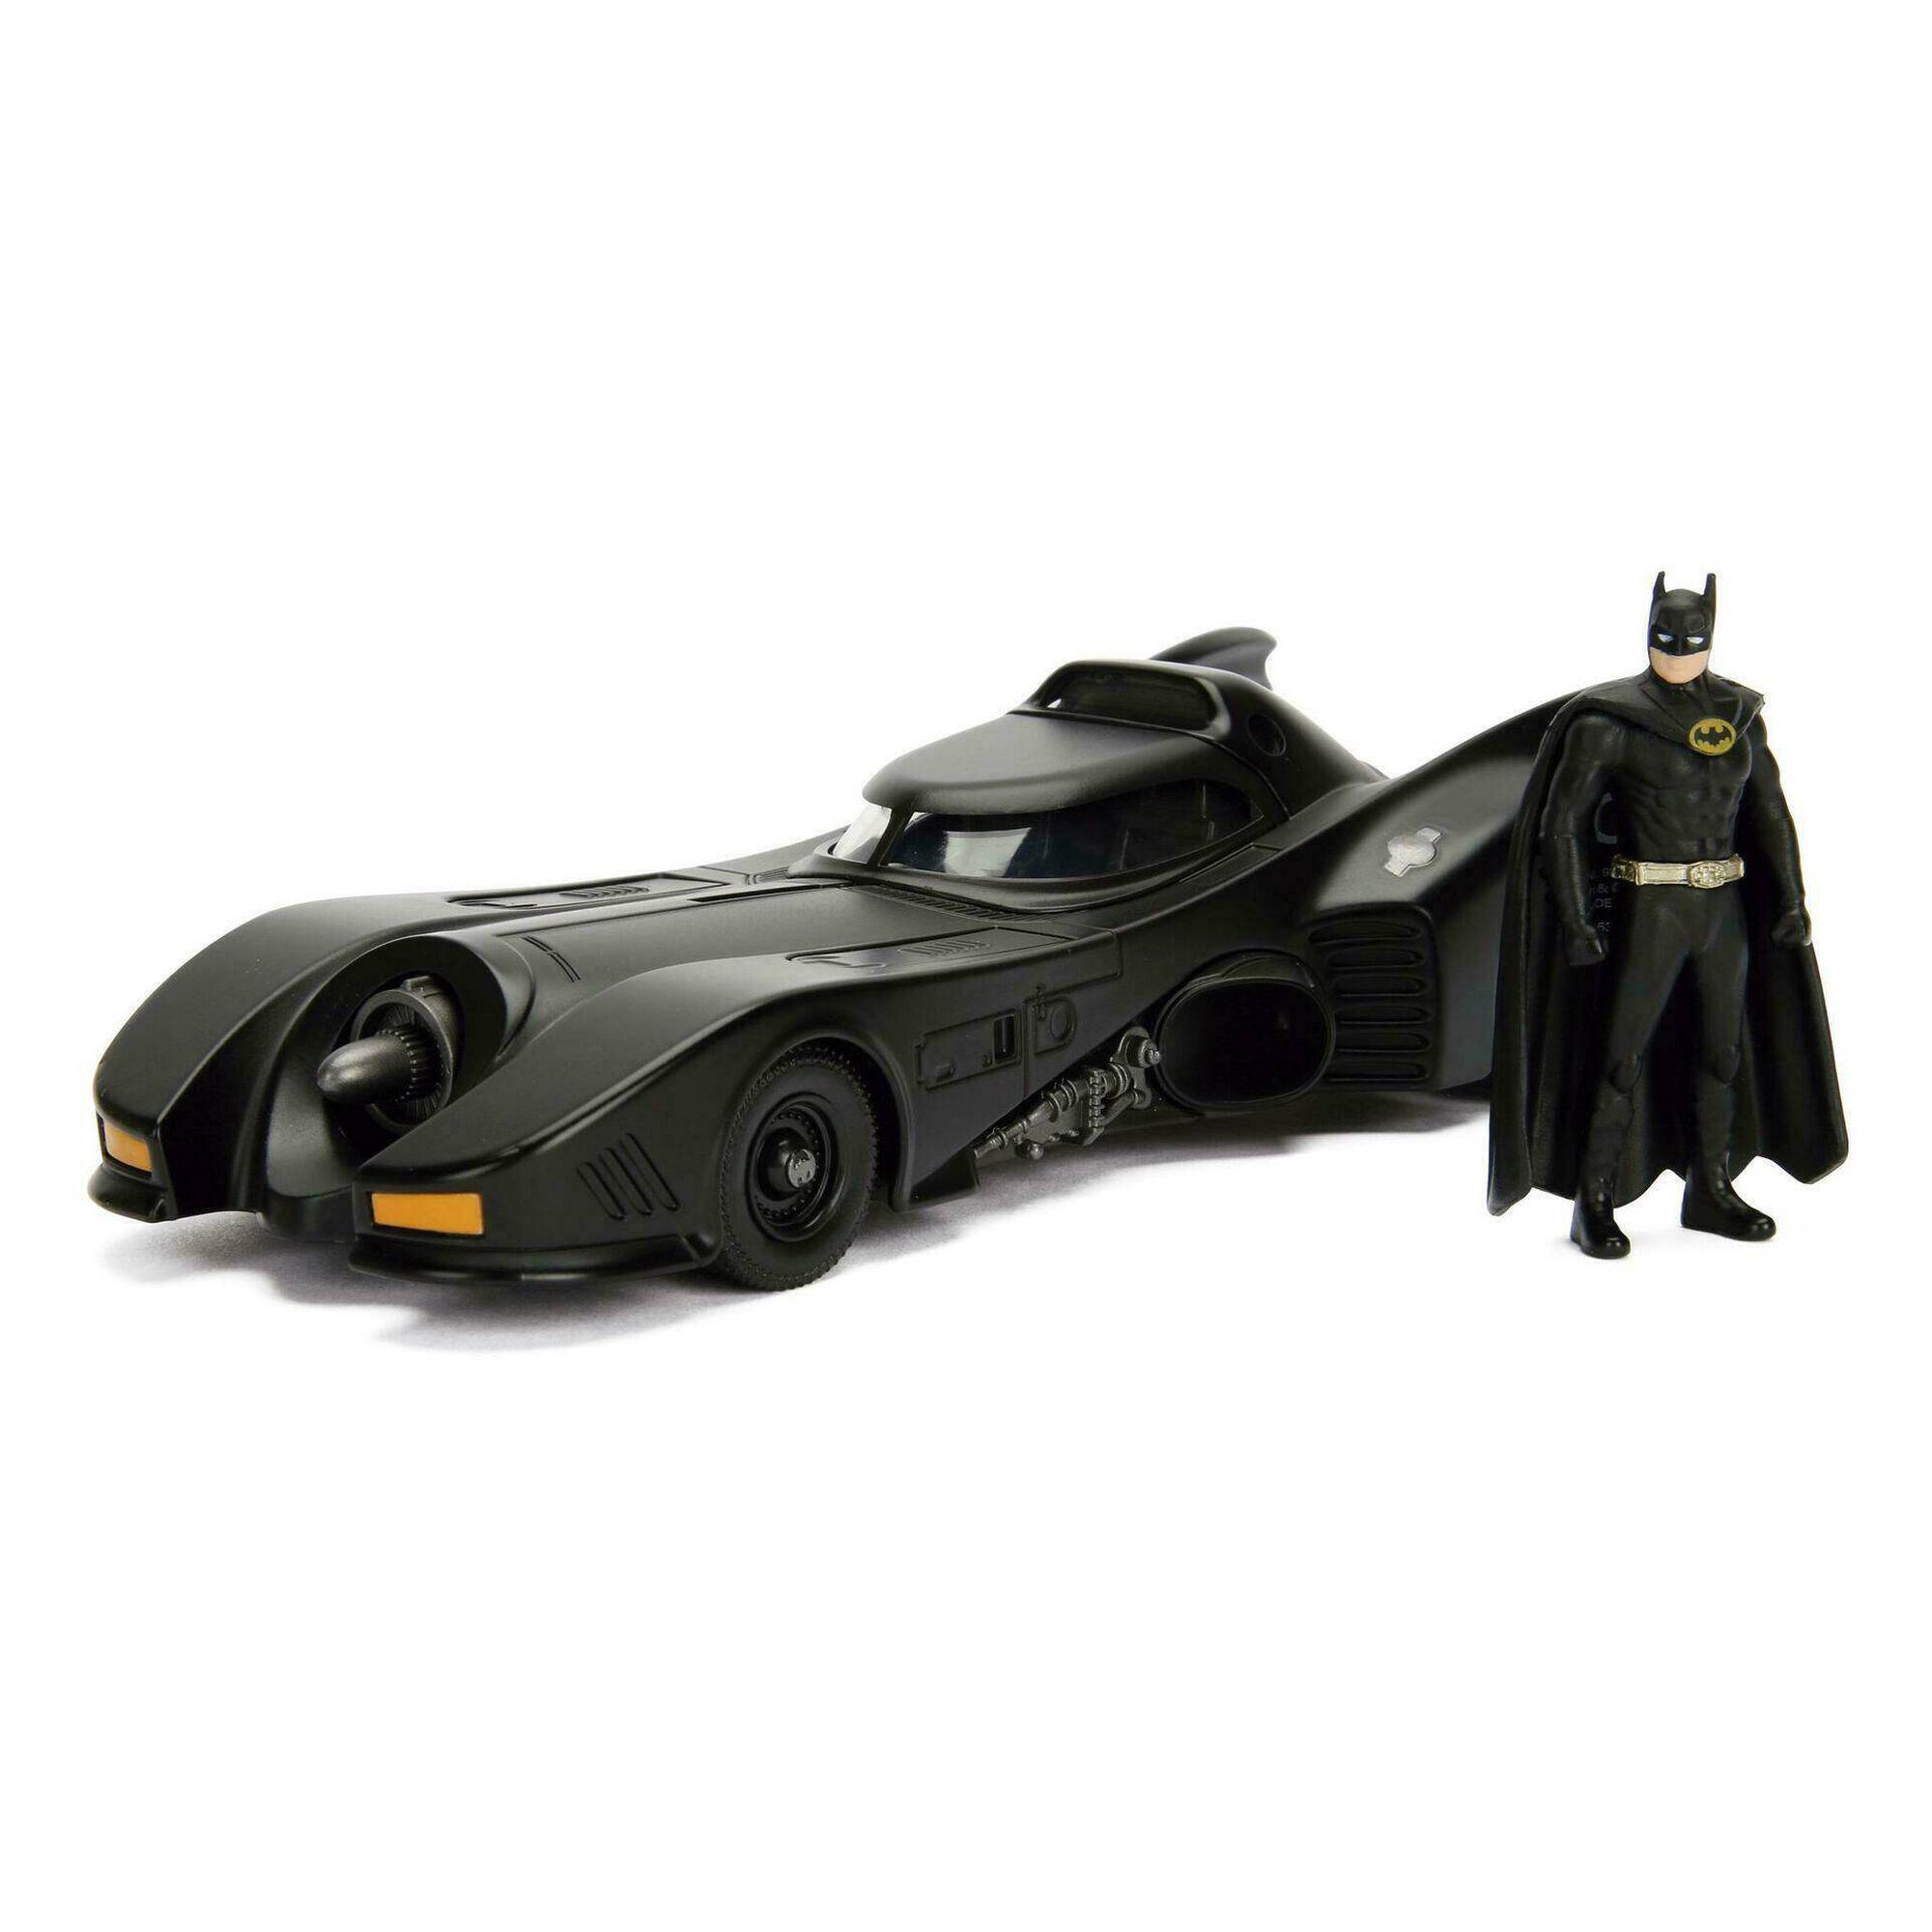 Batmobile 1:24 1989